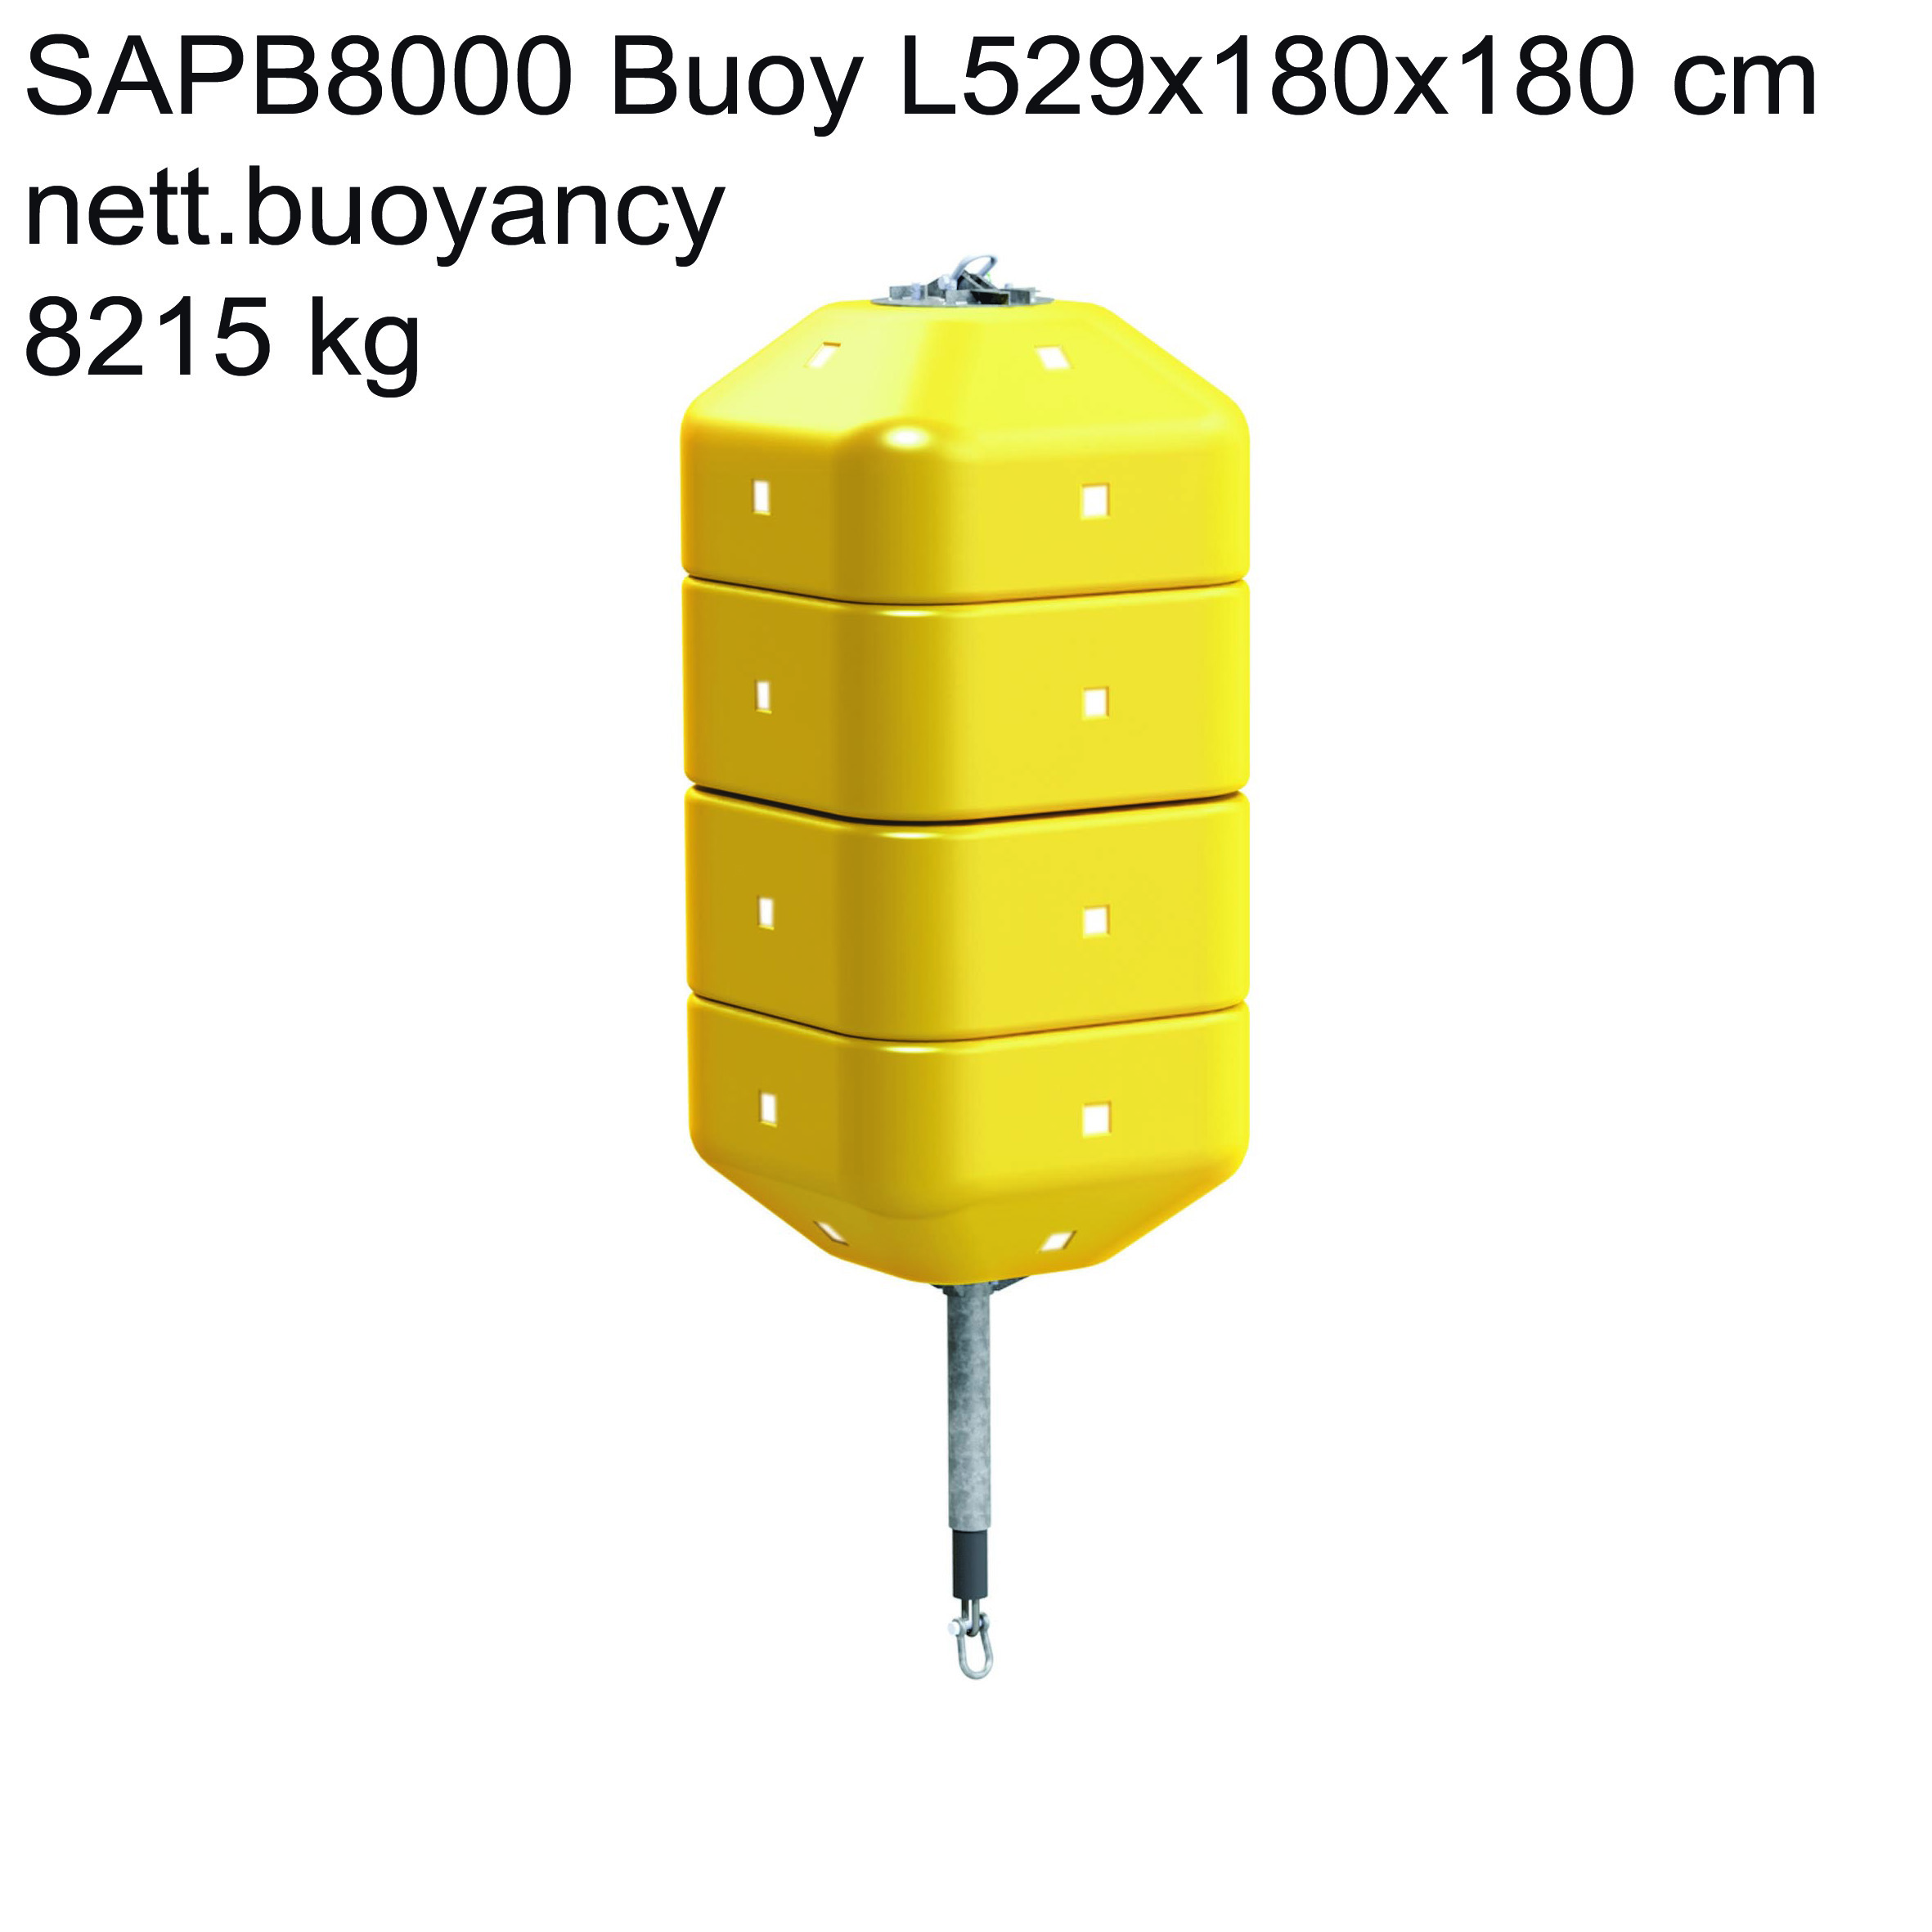 Polyform Abp Modular Pennant Buoy Offshore Foamed Diam